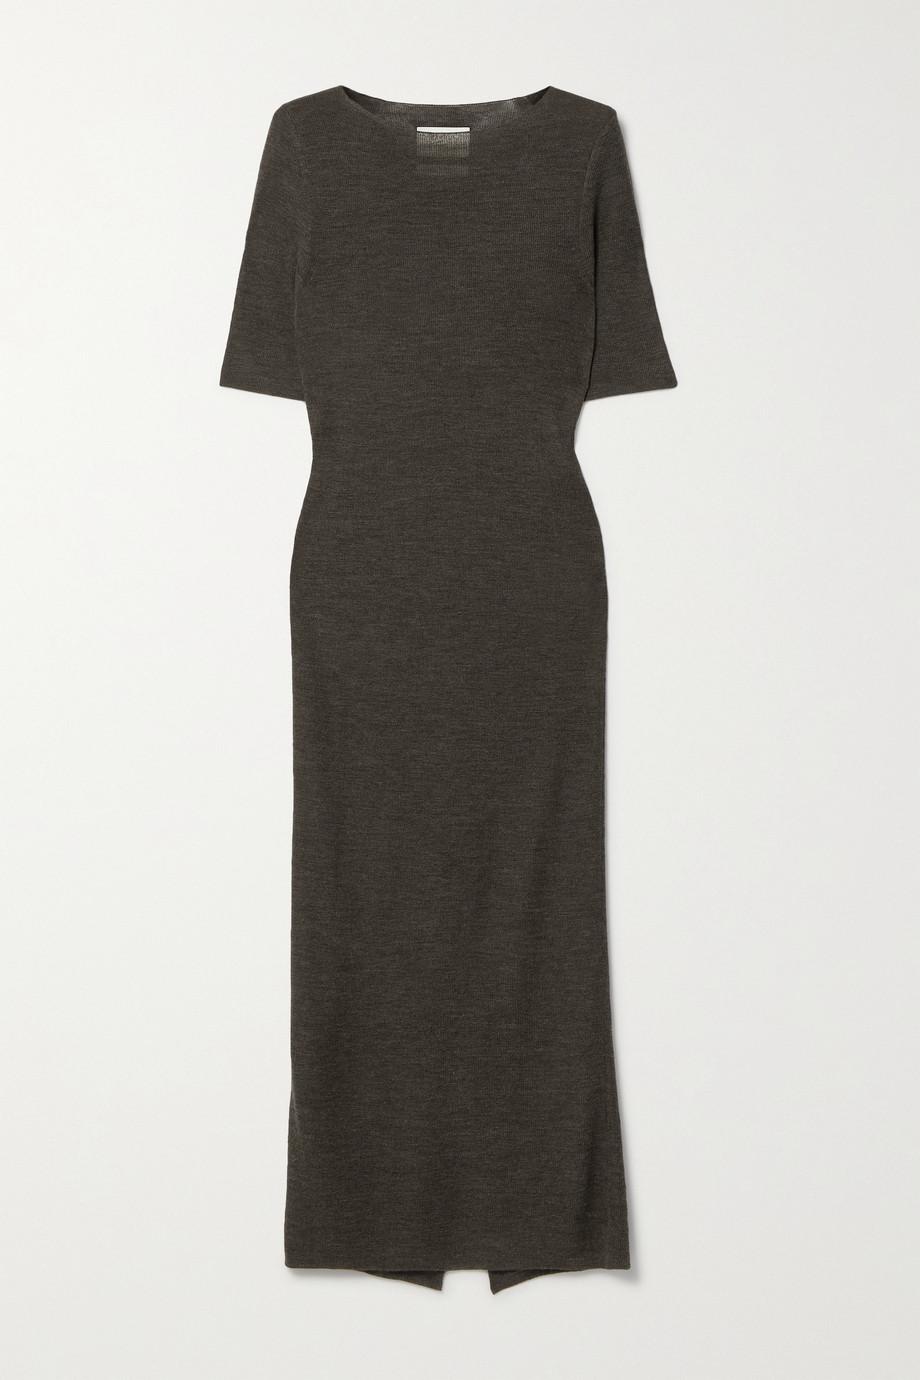 Lauren Manoogian + NET SUSTAIN alpaca, merino wool and mulberry silk-blend midi dress